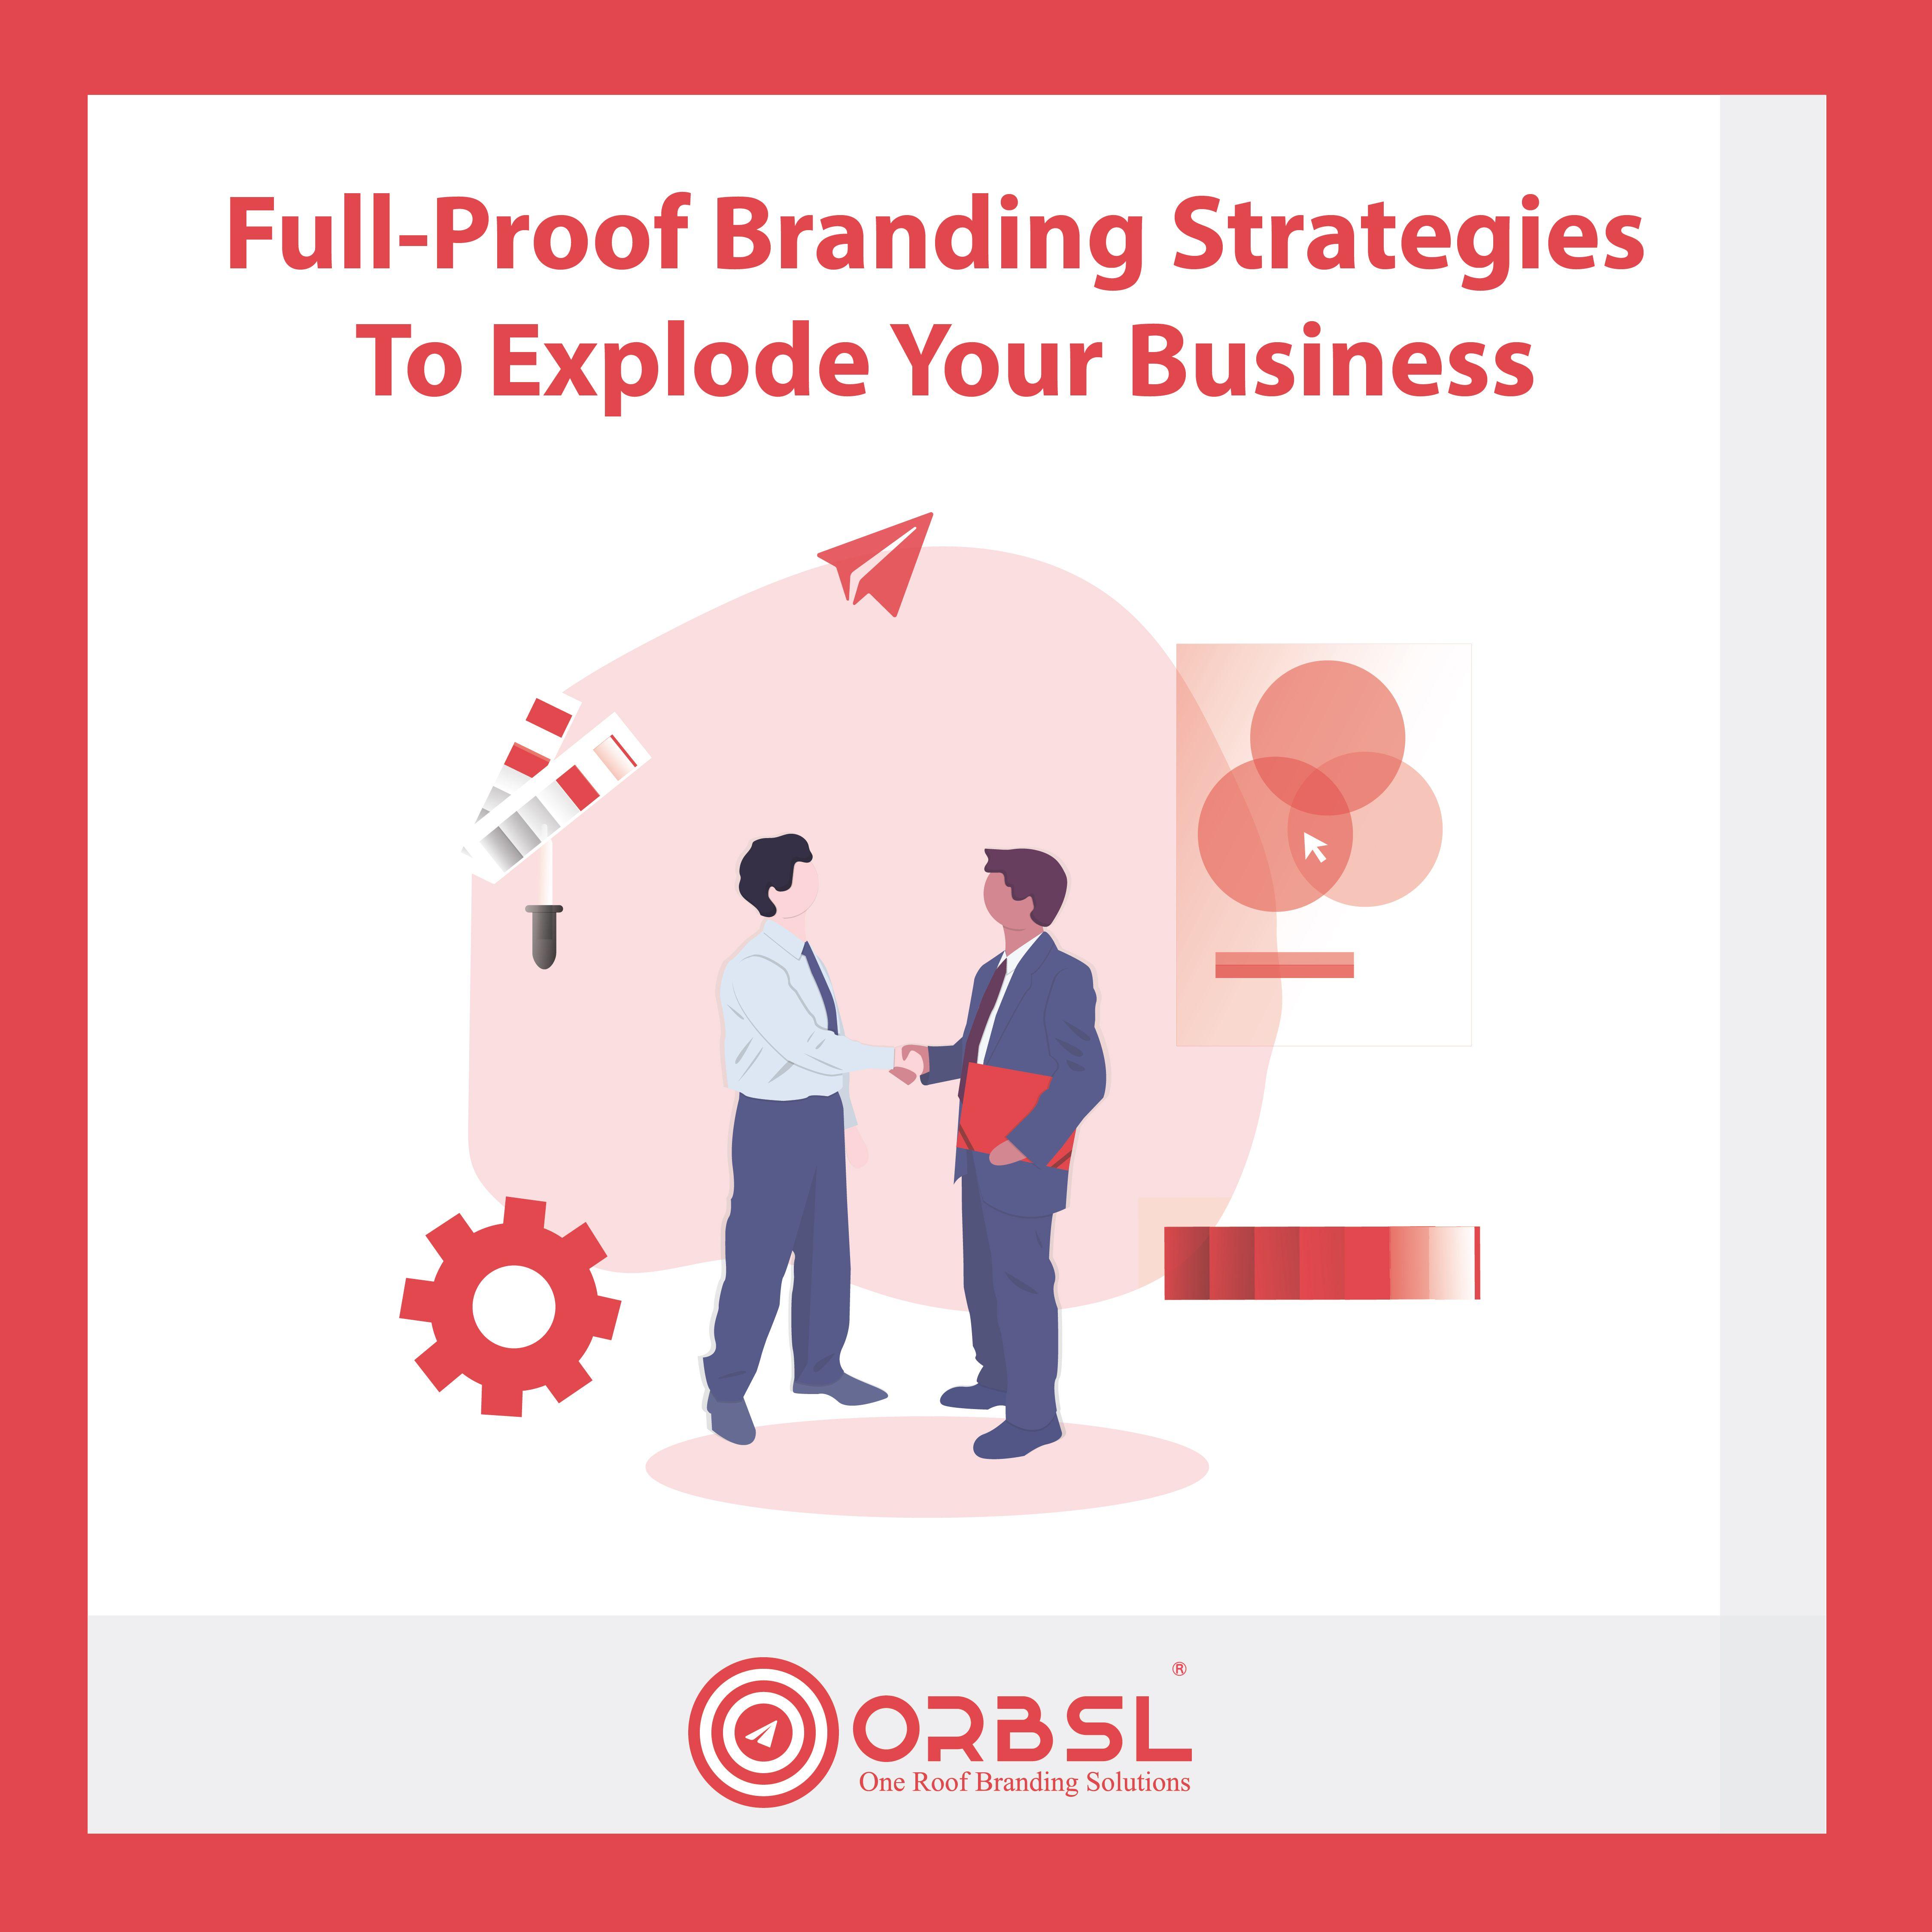 FullProof Branding Strategies To Explode Your Business